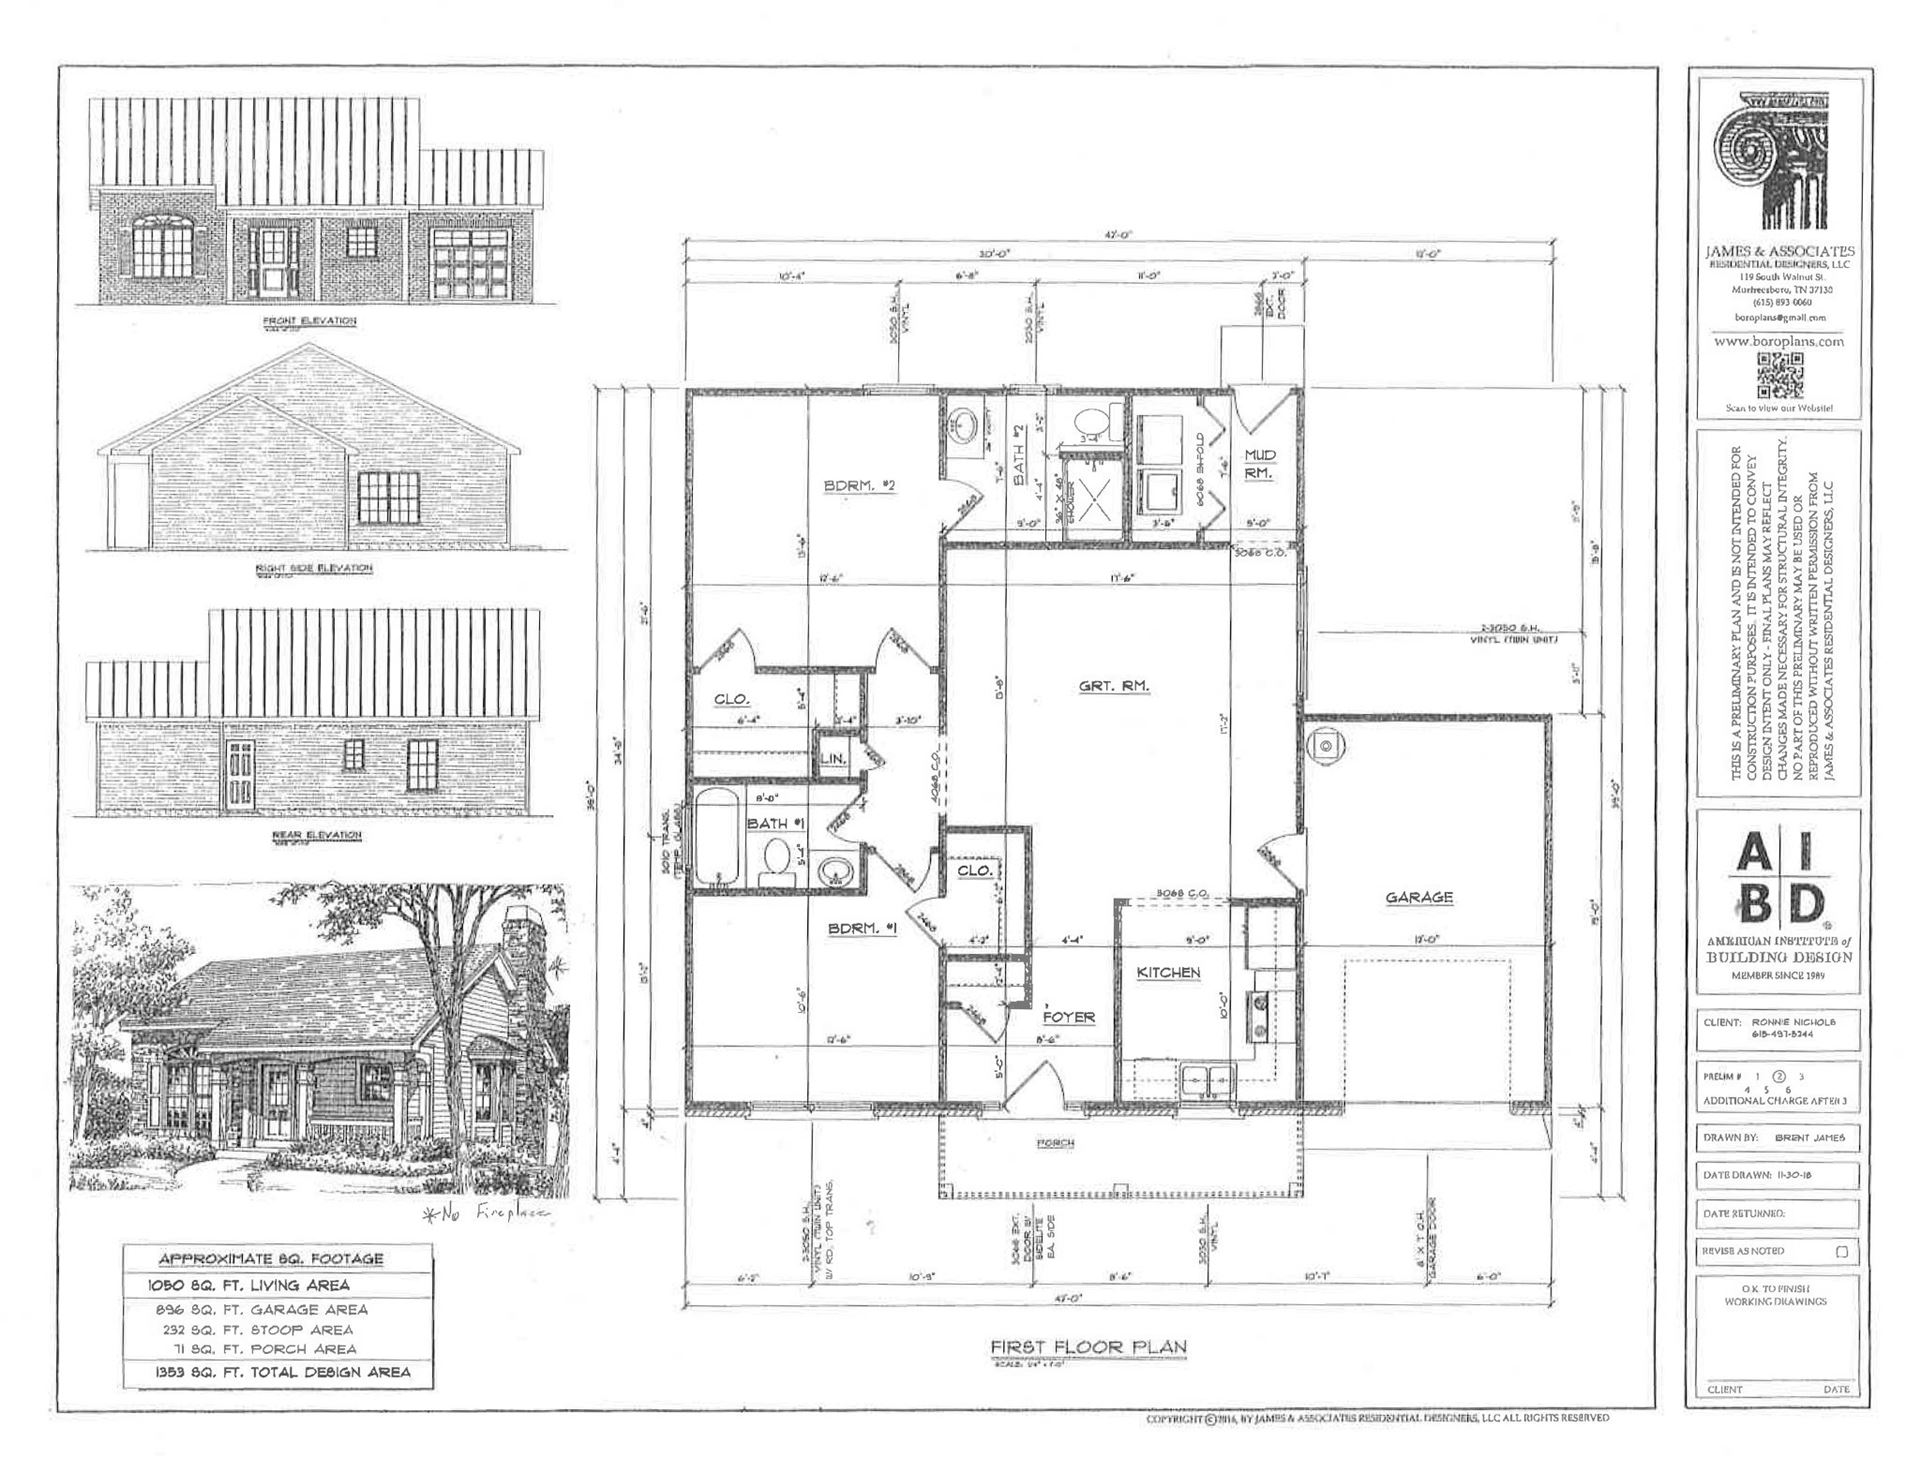 0 Nichols Dr., Woodbury, TN 37190 - MLS#: 2188121